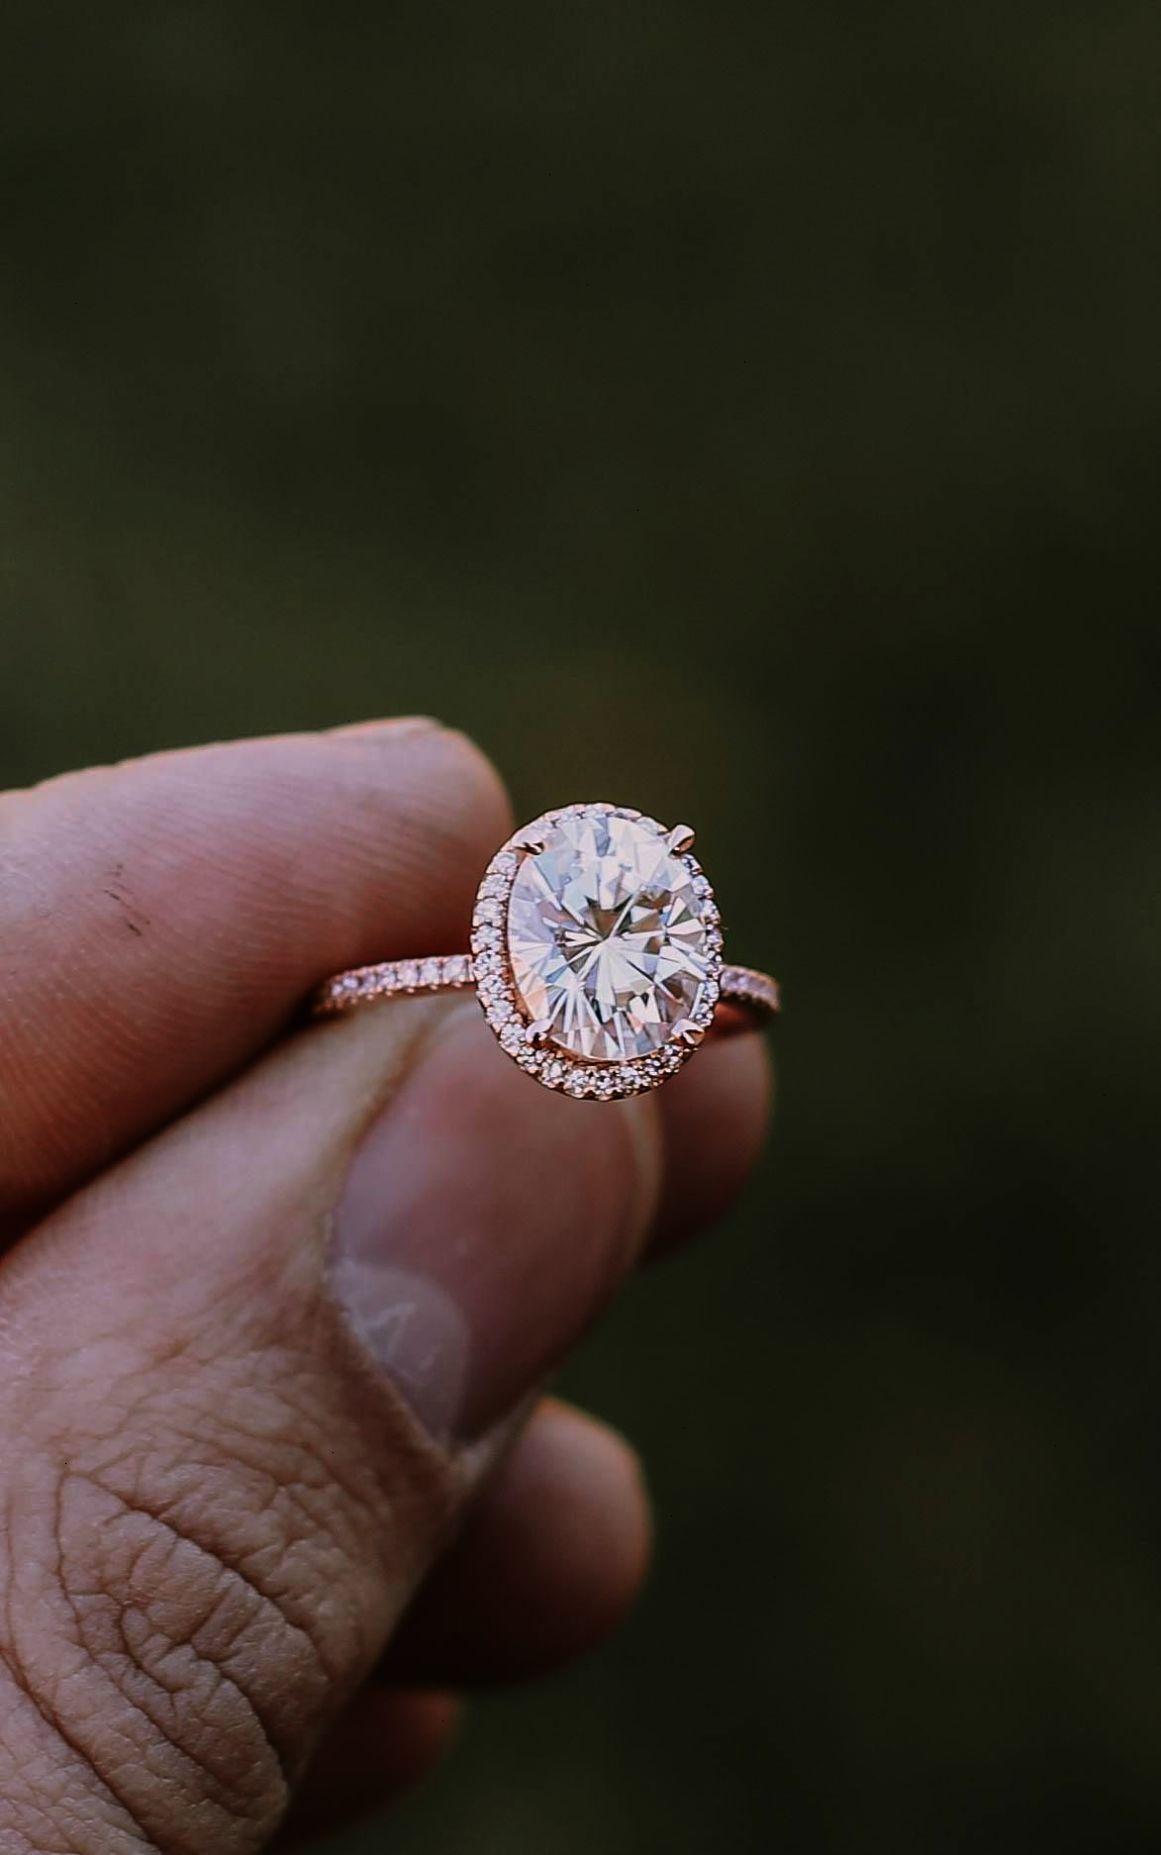 Vintage Round Wedding Rings Vintage Rose Gold Engagement Rings South Africa Wedding Rings Round Wedding Rings Halo Wedding Rings Unique